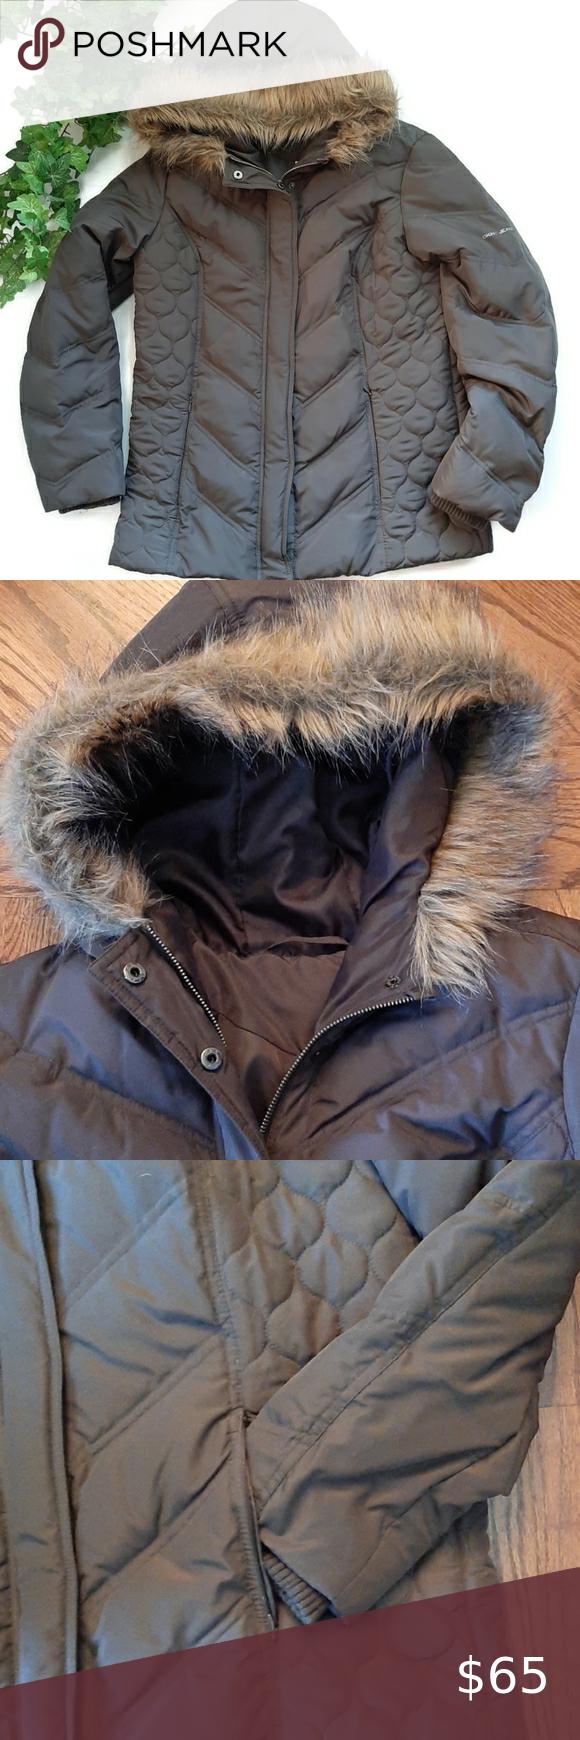 Euc Dkny Chic Brown Down Filled Puffer Coat In 2021 Boho Leather Jacket Puffer Coat Coats Jackets Women [ 1740 x 580 Pixel ]